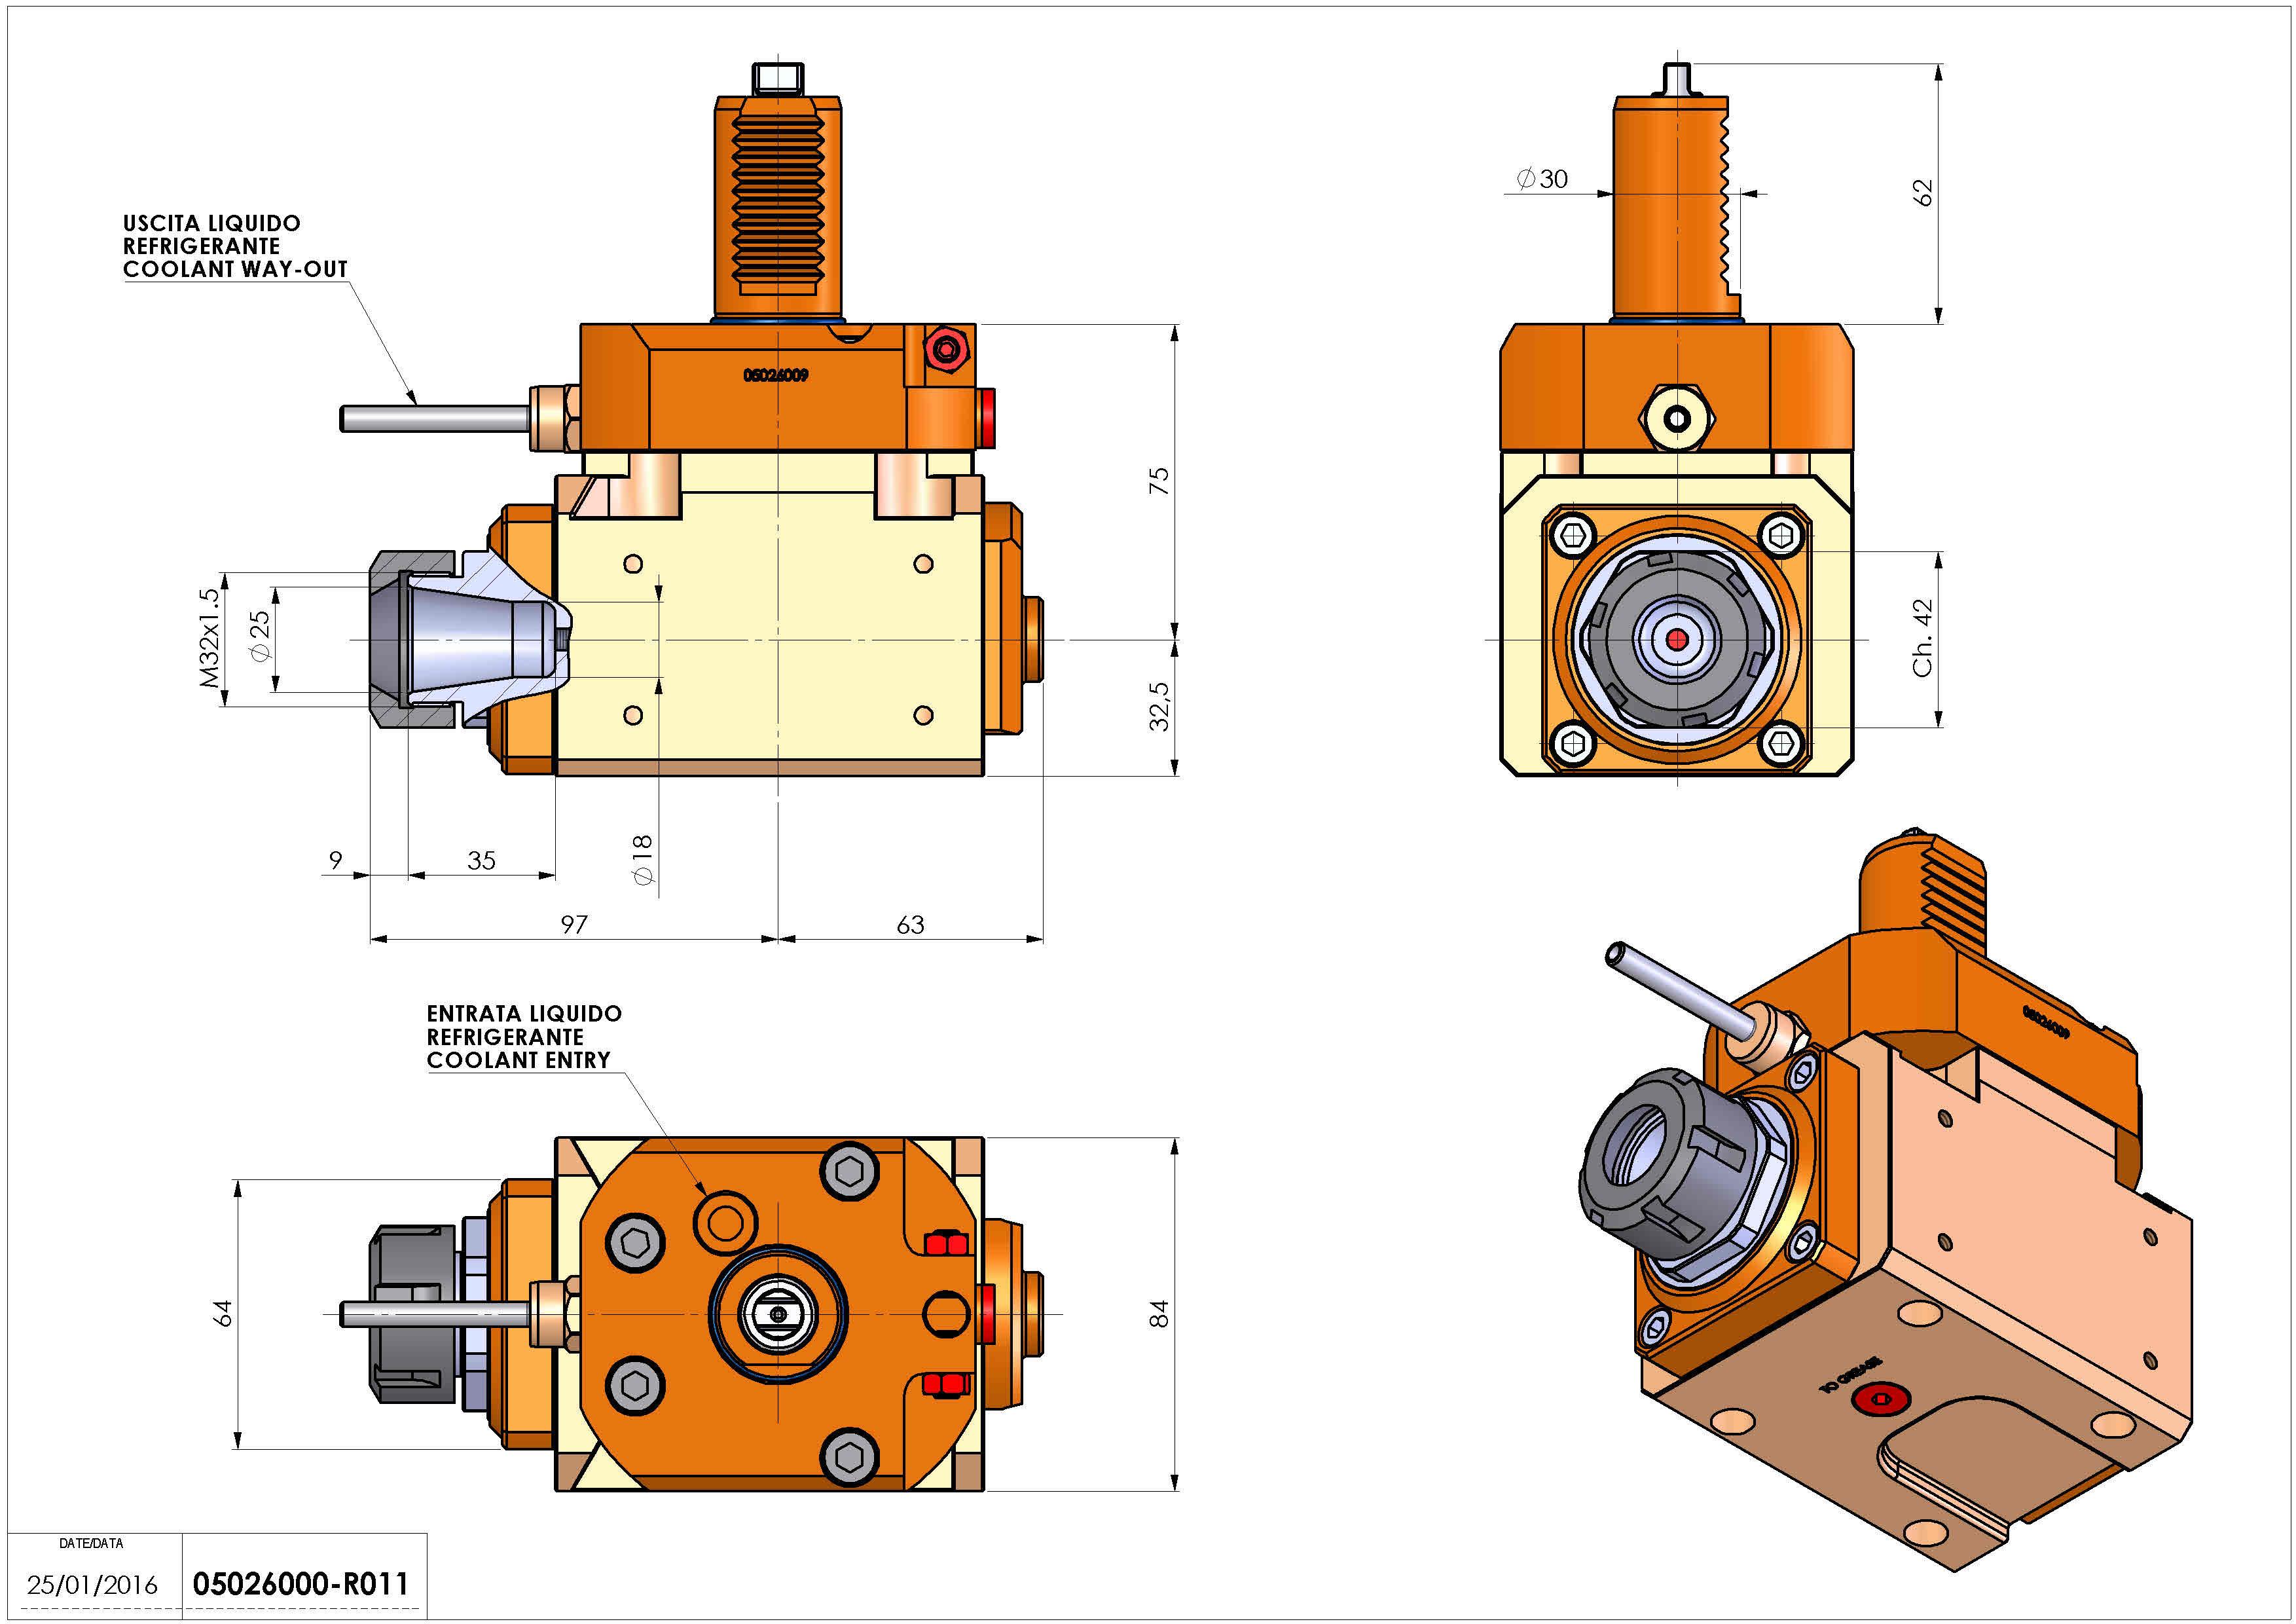 Technical image - LT-A VDI30 ER25 R 1:2 H75 TZ.